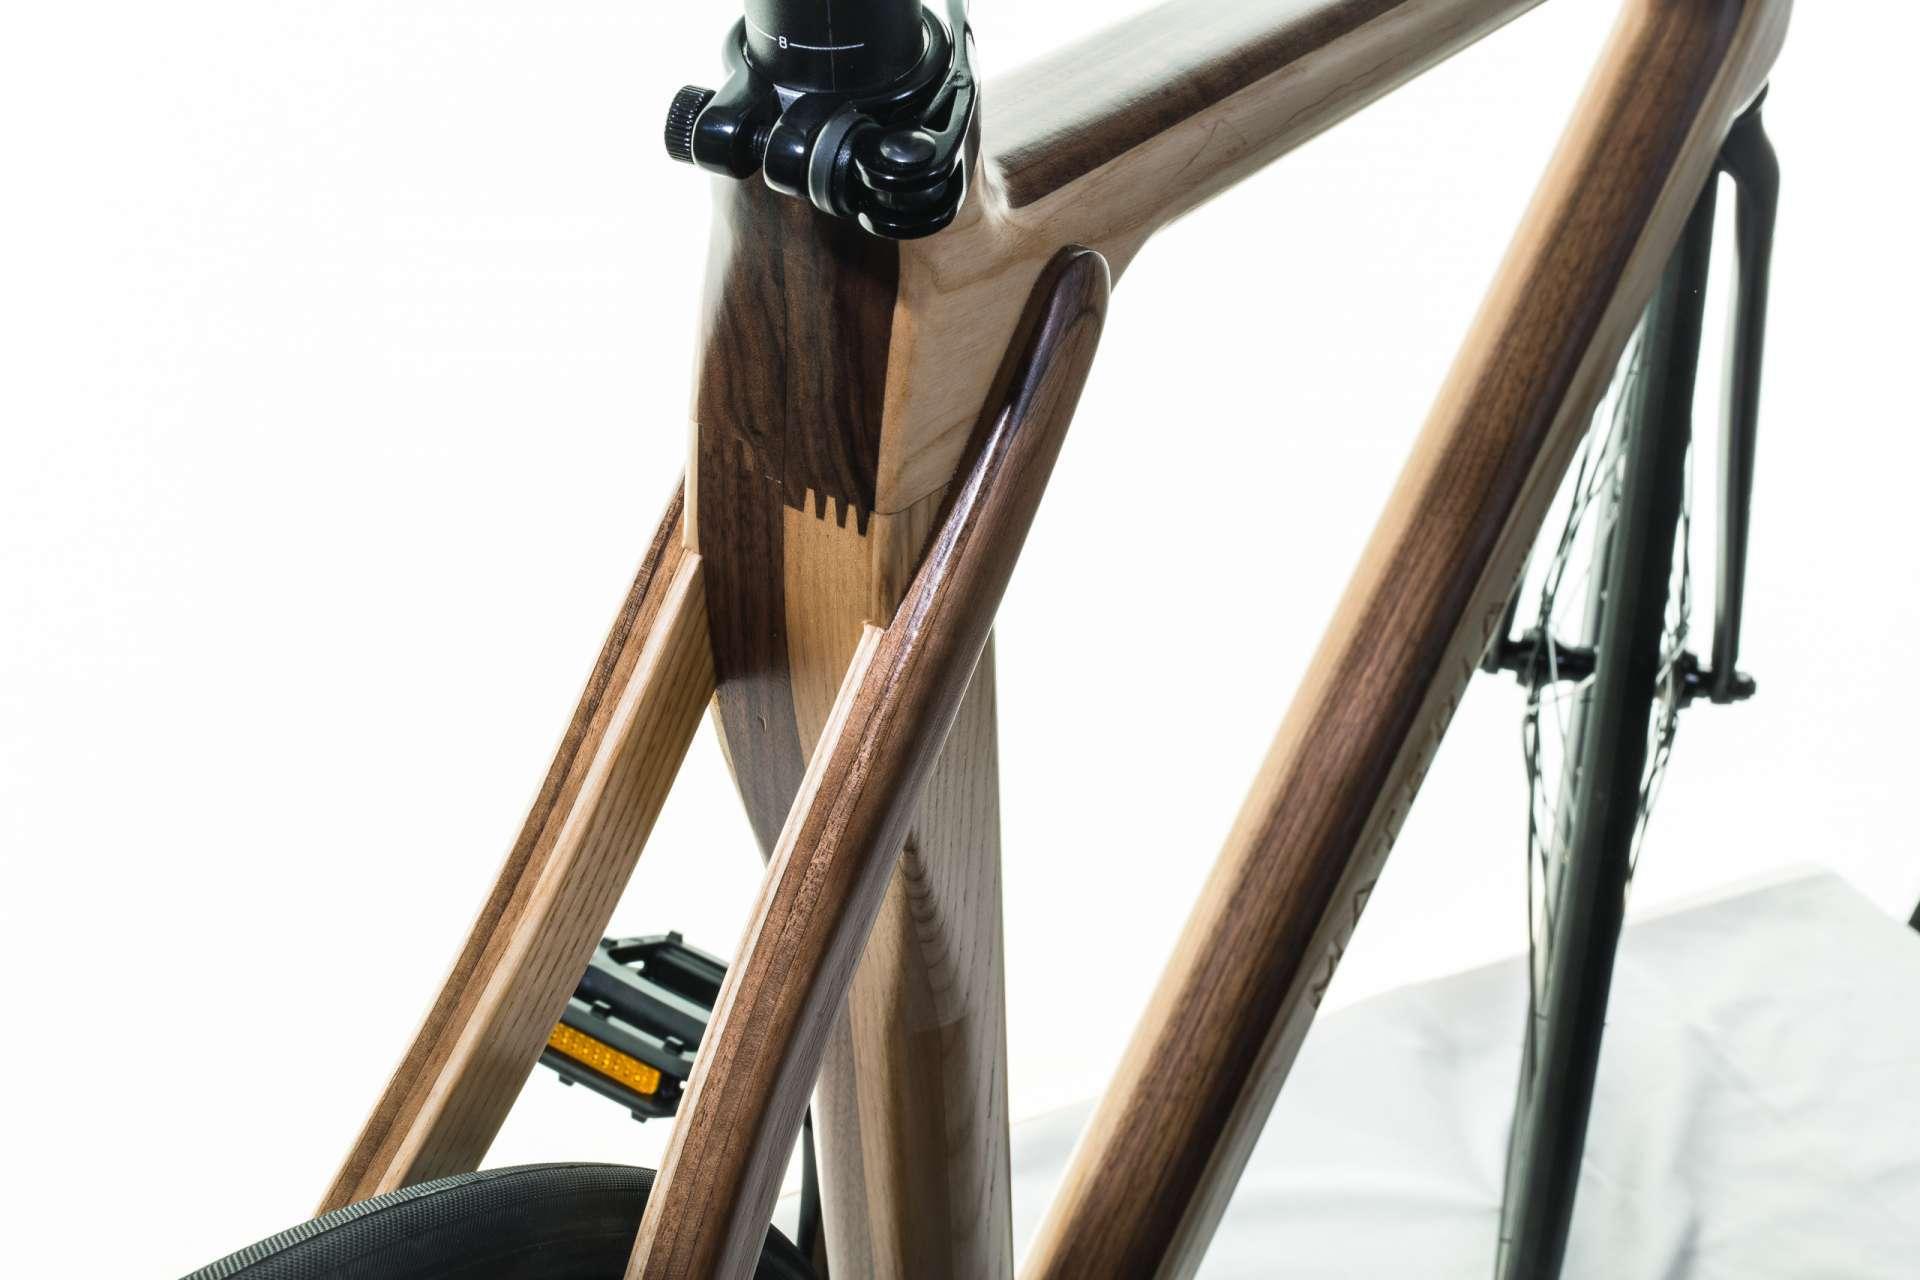 Materia Bikes - Wooden bicycle - Fixed-gear Bike WUDU